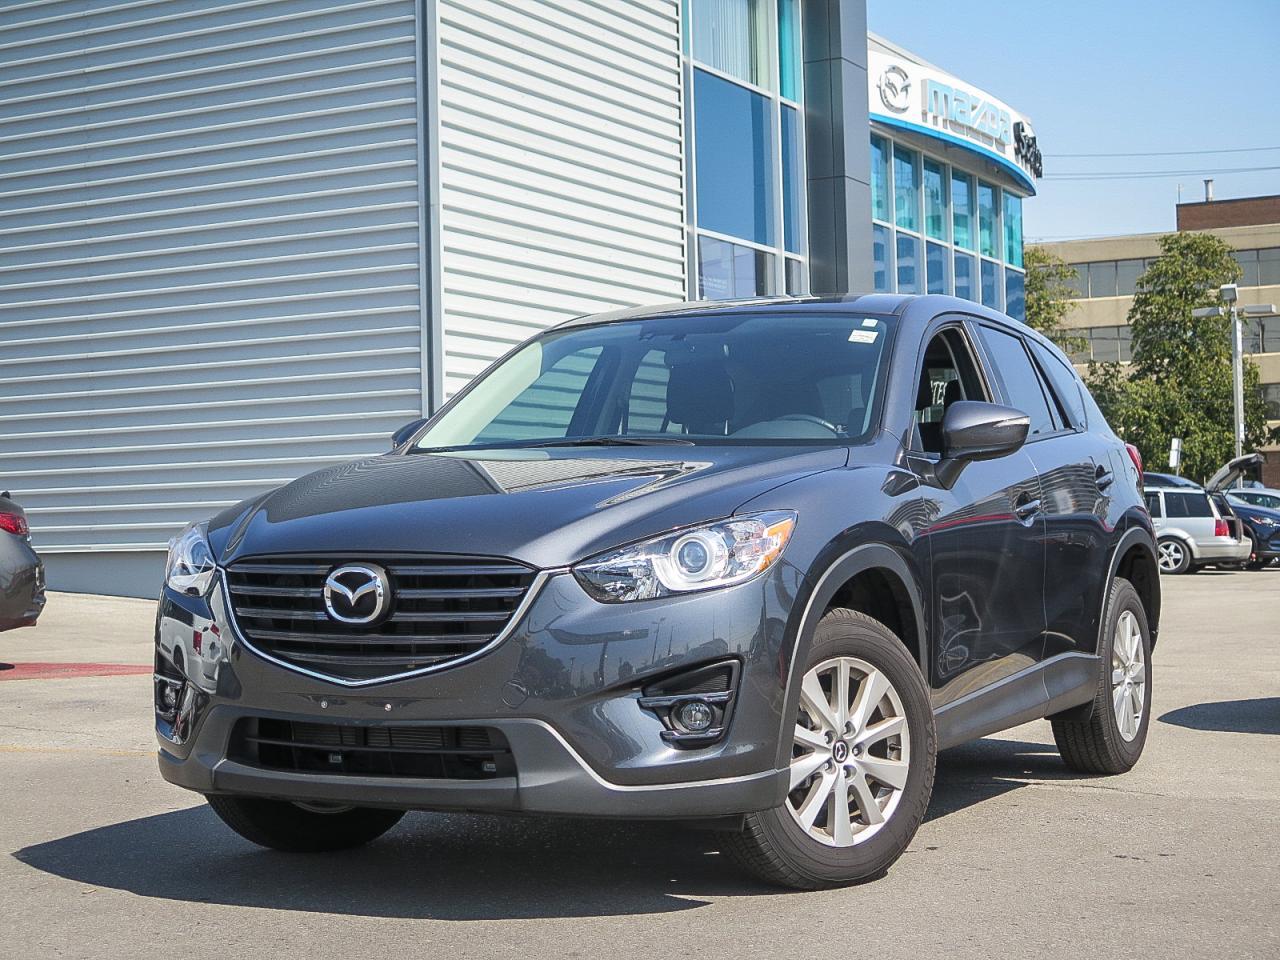 2016 Mazda CX-5 AWD LEATHER DEMO 0% FINANCE